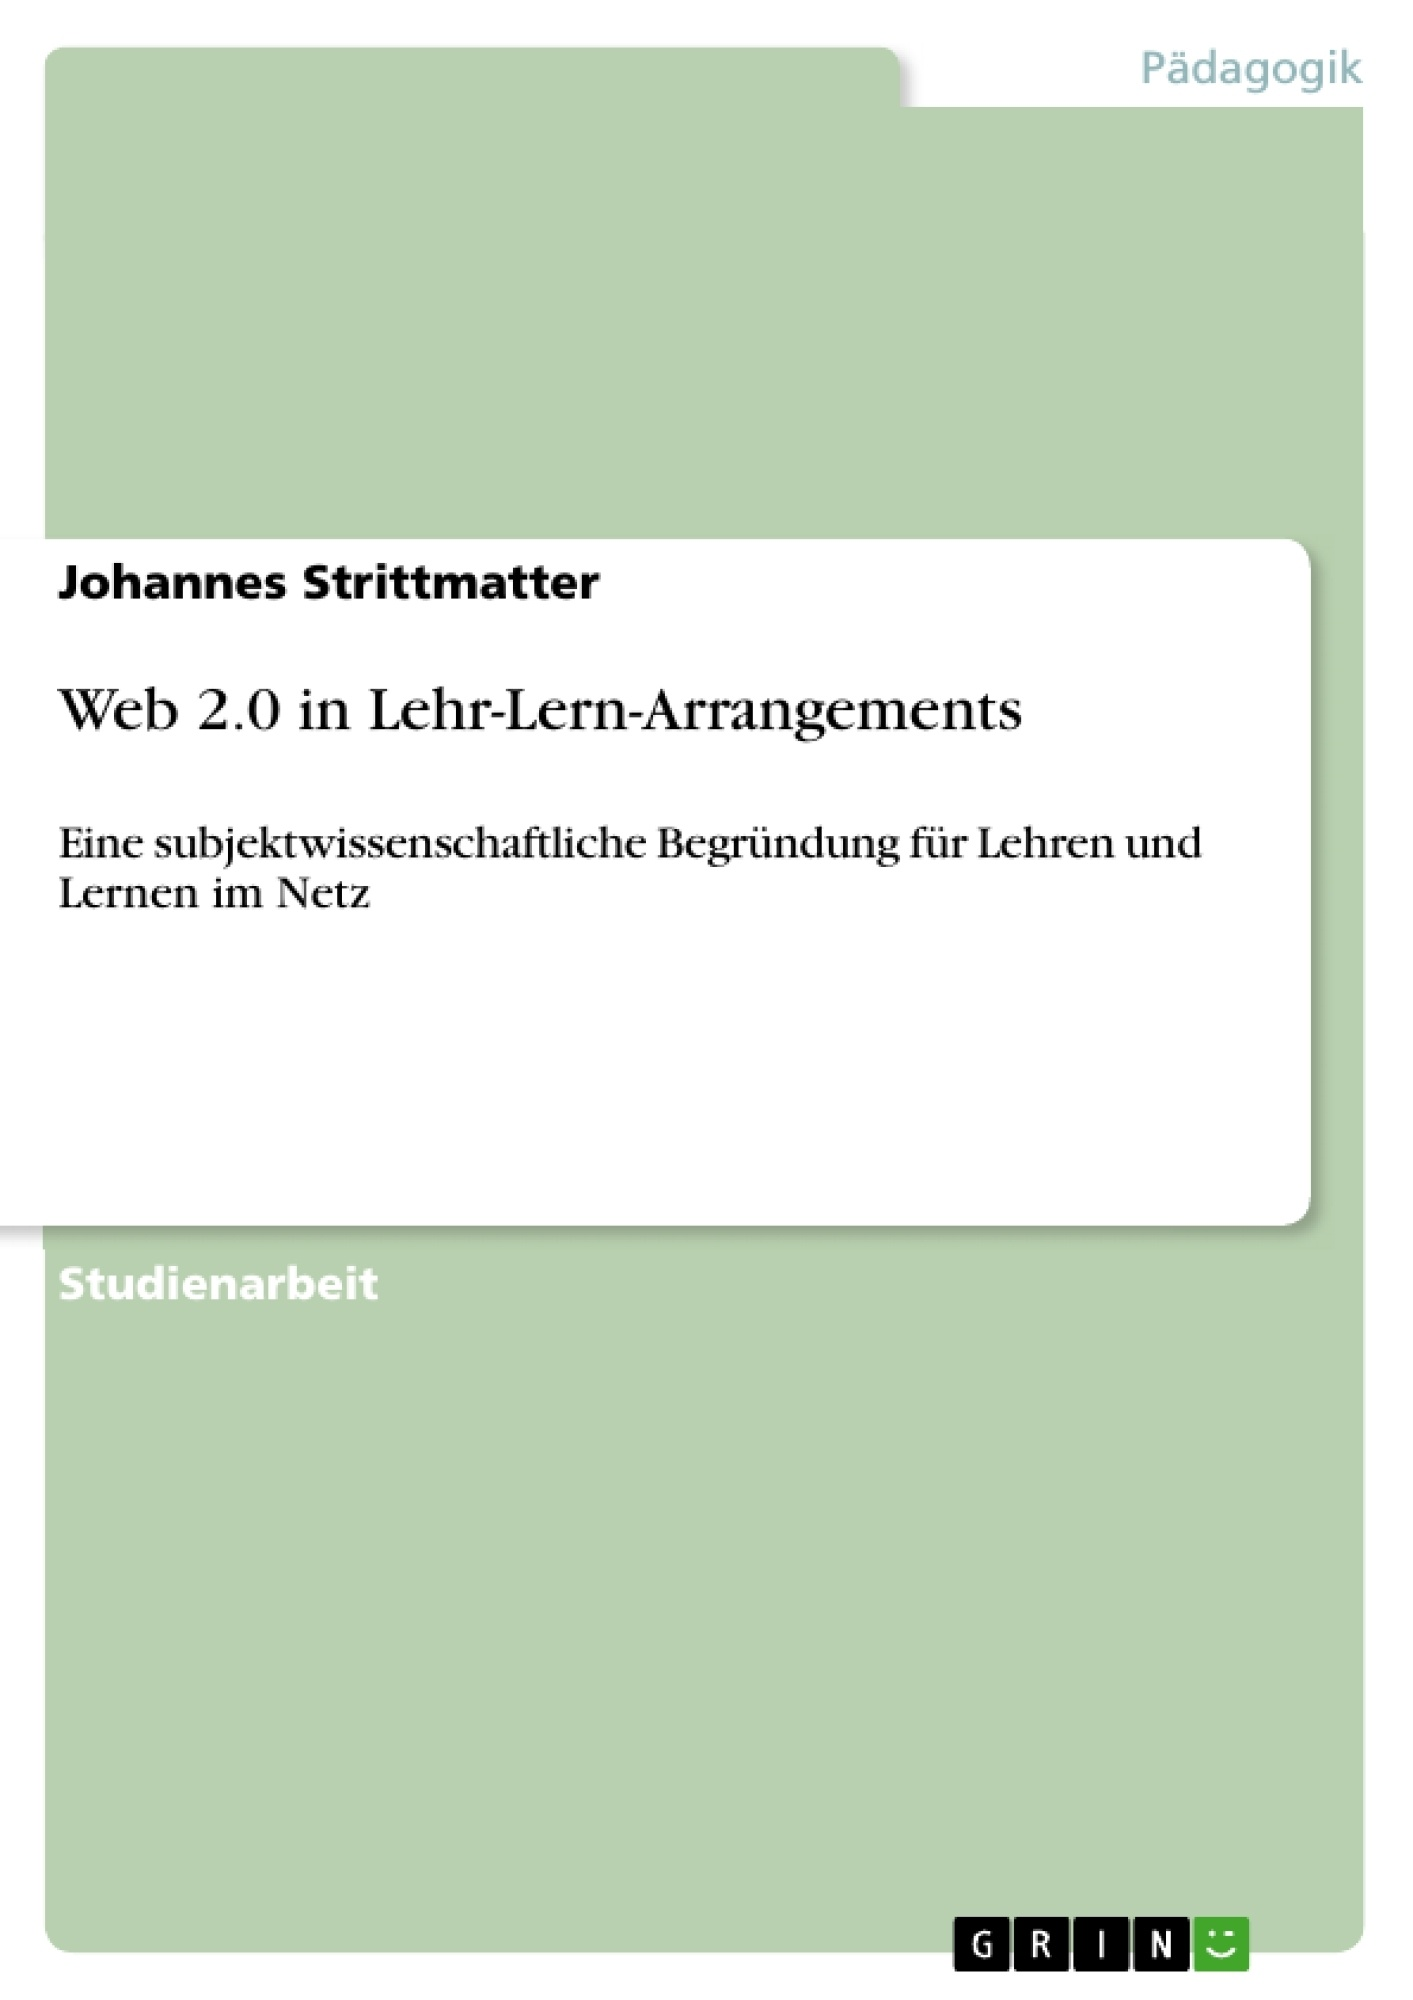 Titel: Web 2.0 in Lehr-Lern-Arrangements